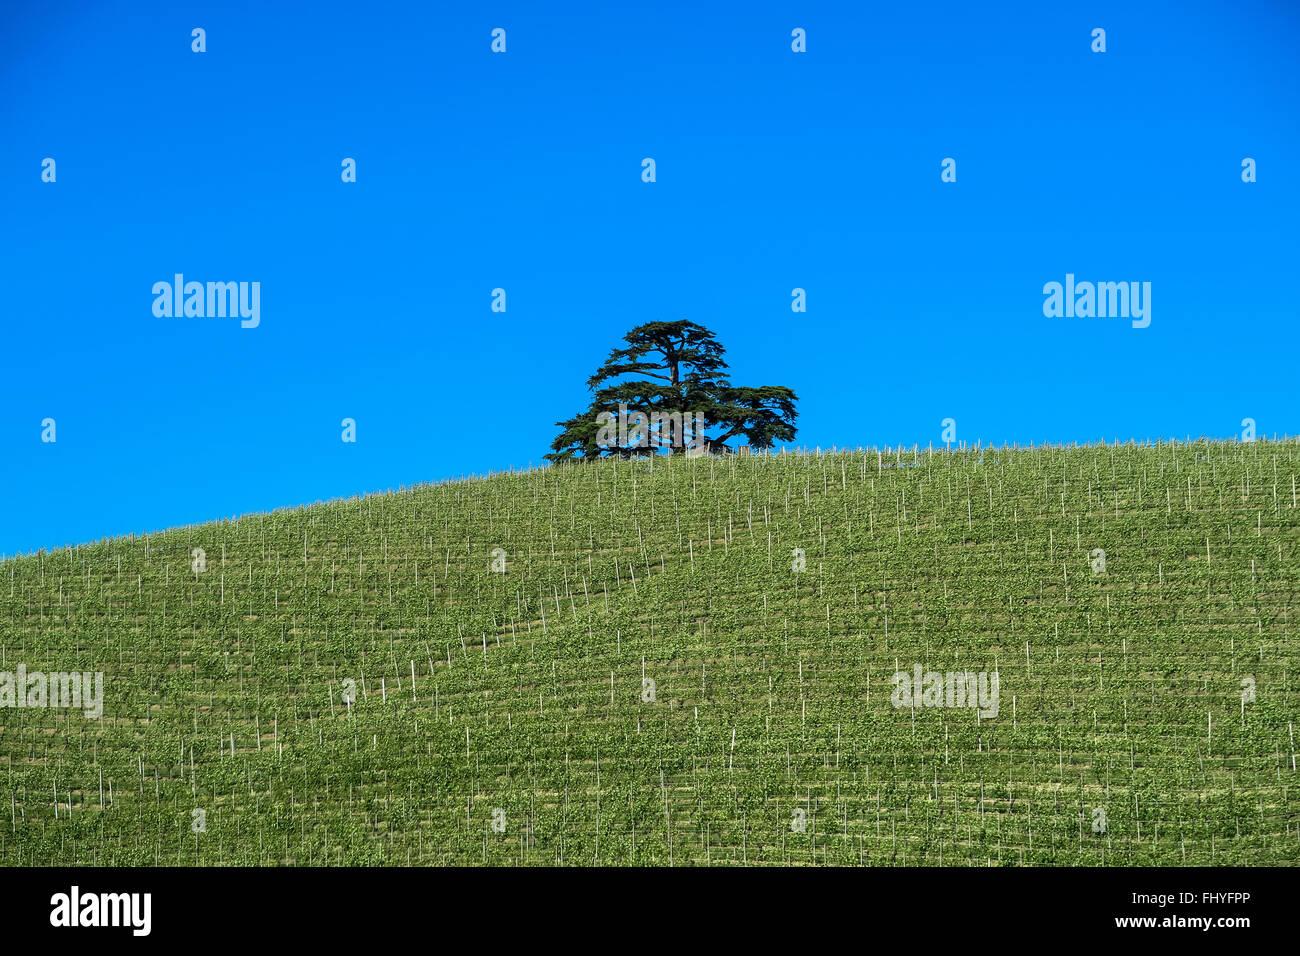 Baum, Tree, Weinberg, vineyard, Piemont, piedmont, Cedrus libani, Zeder Stock Photo